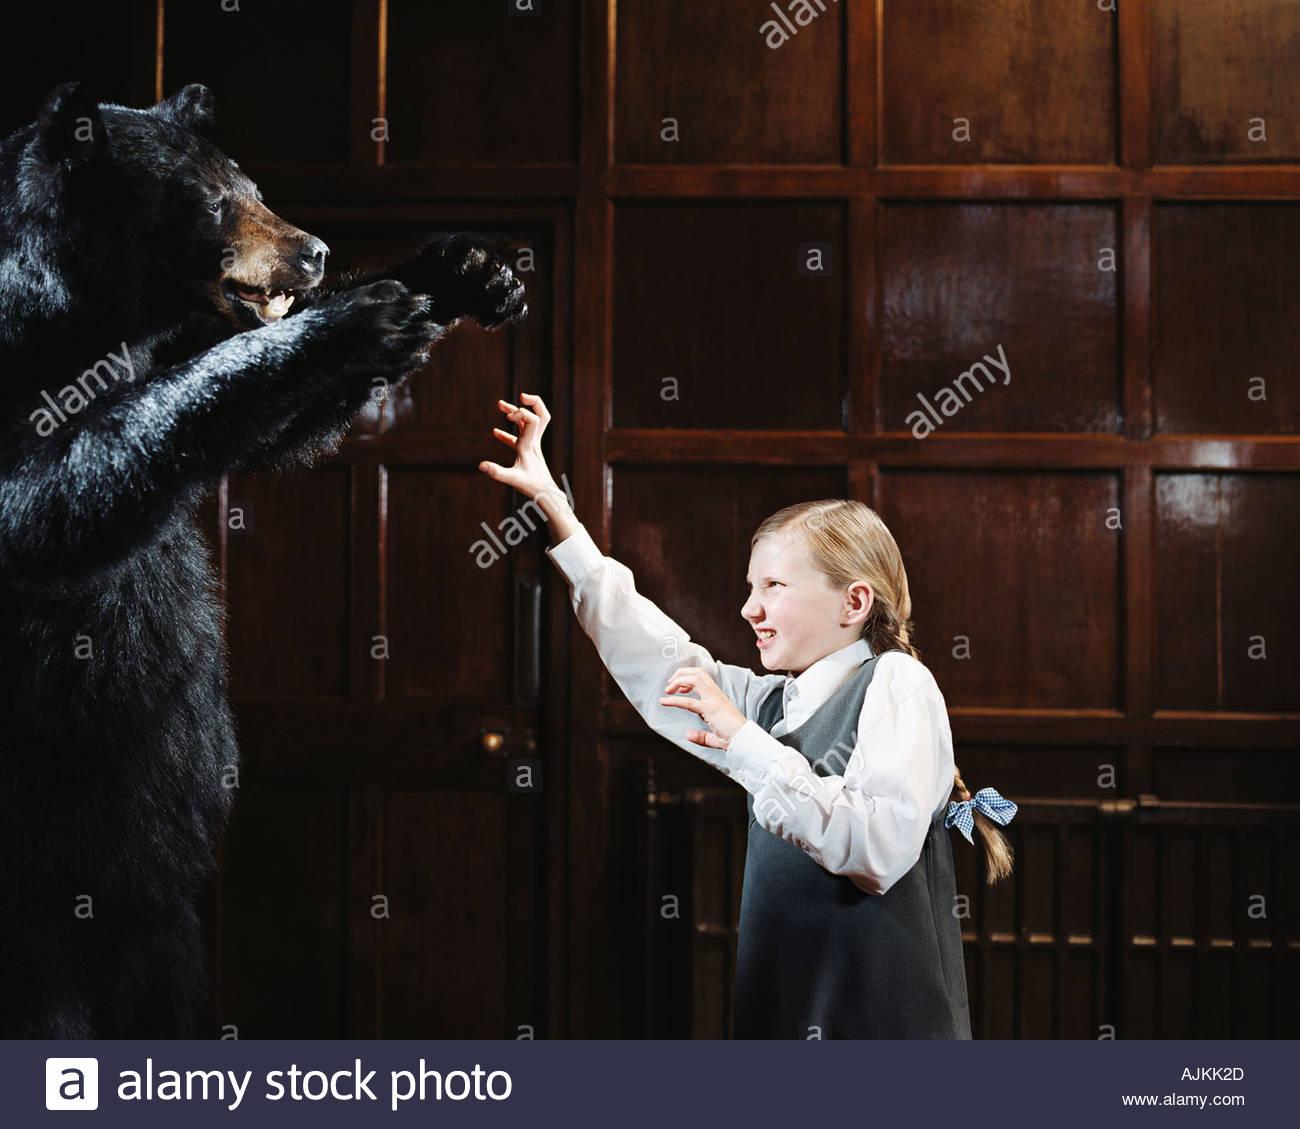 School girl growling at bear - Stock Image